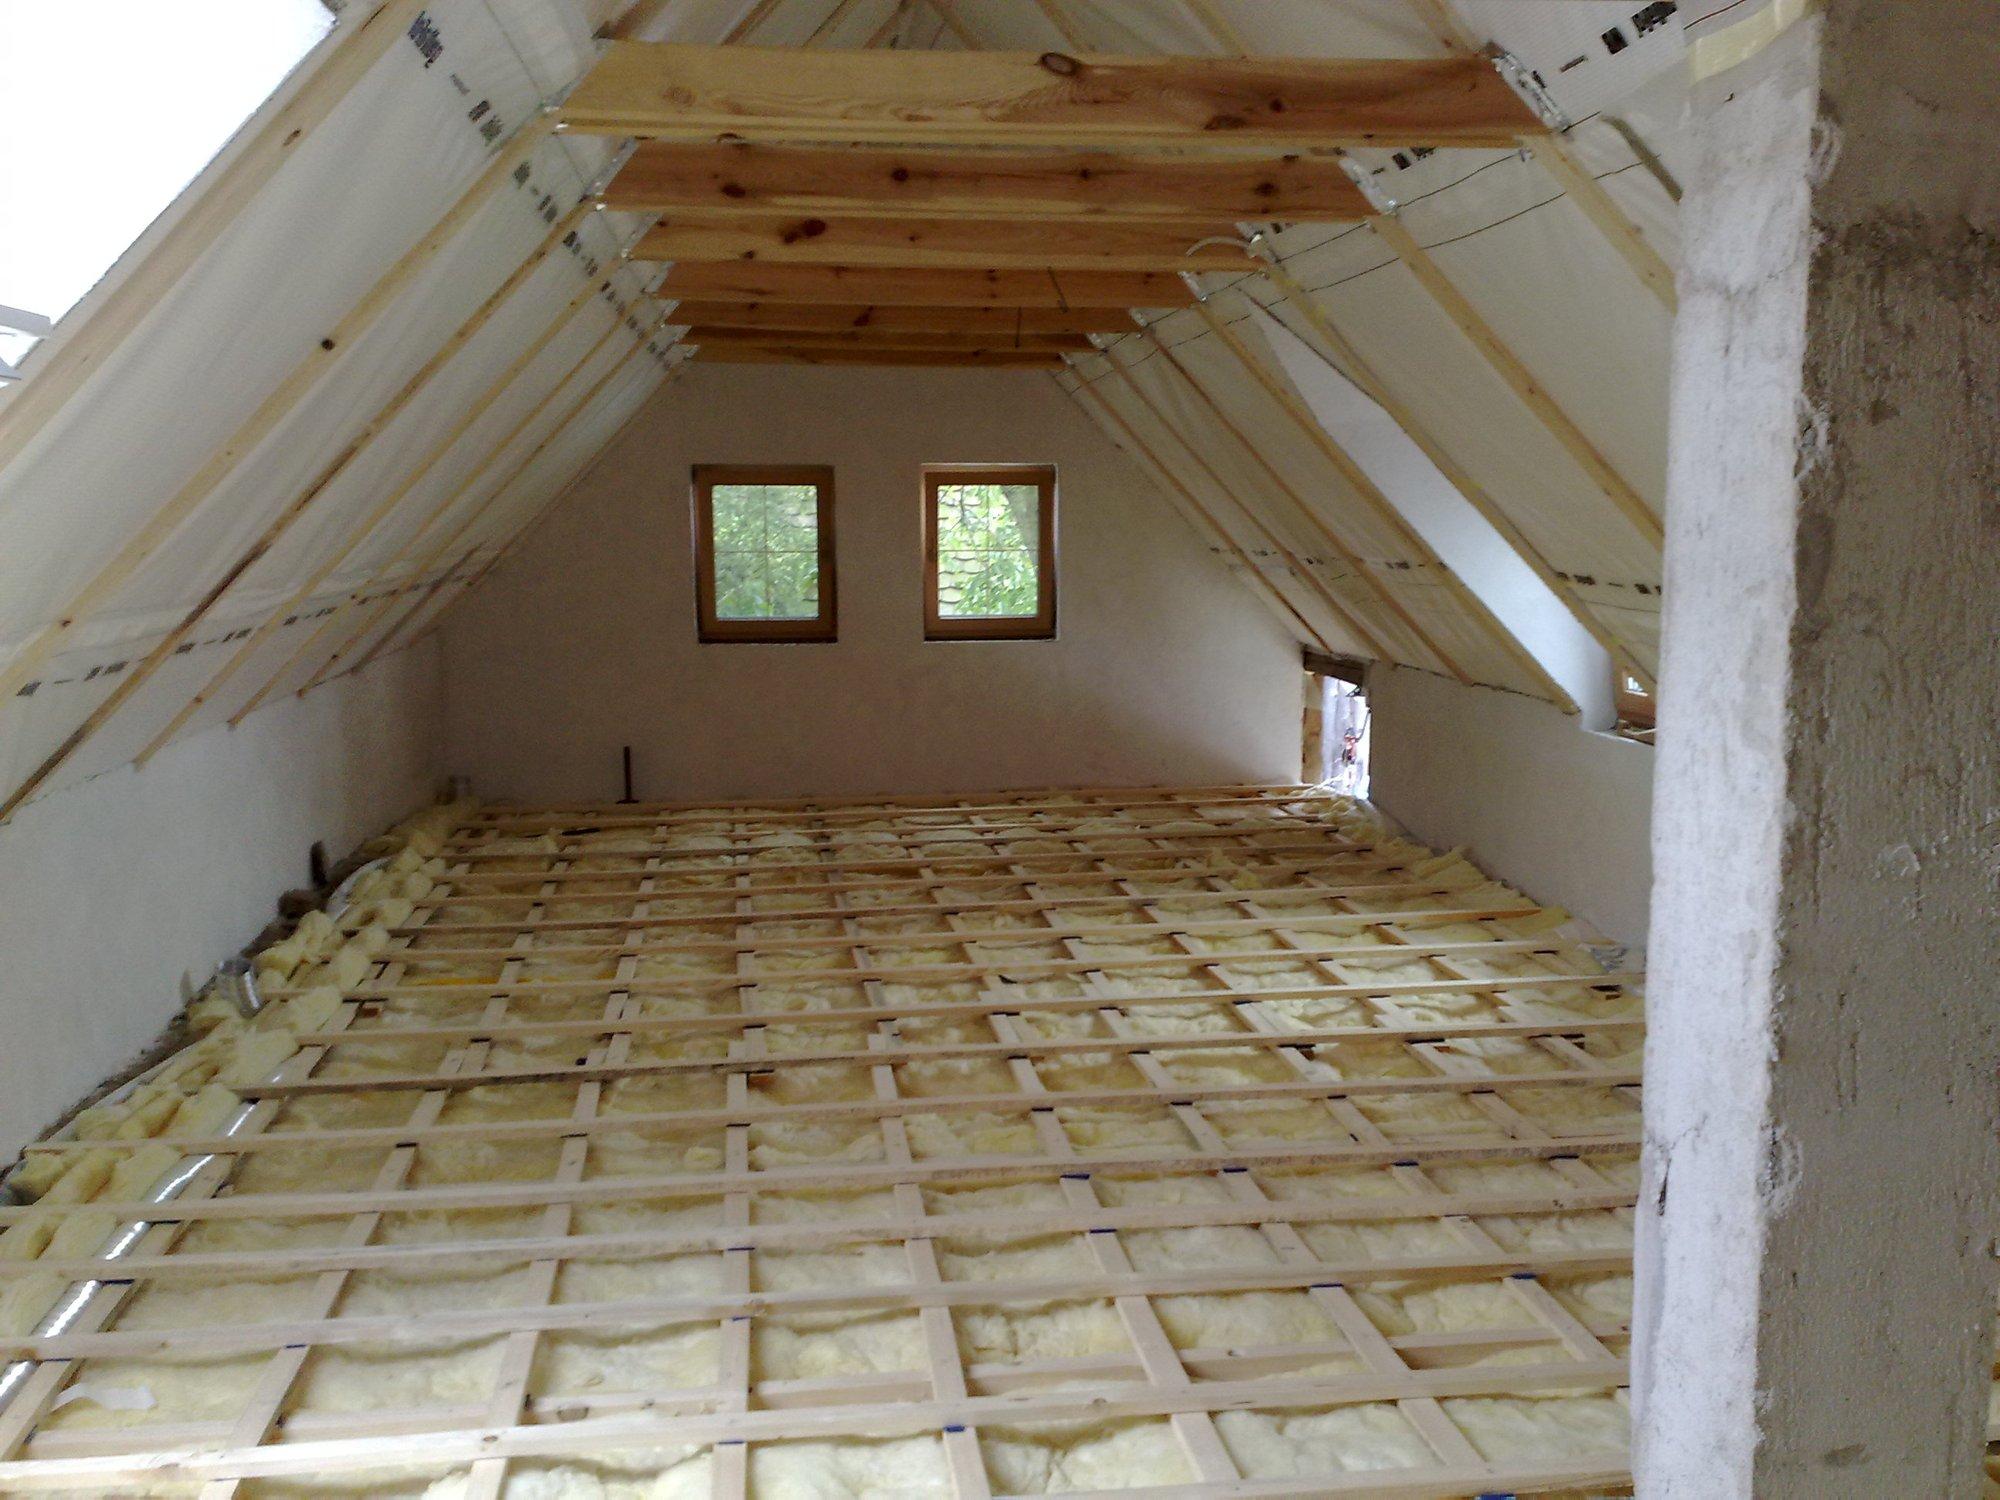 Odhlucneni dreveneho stropu